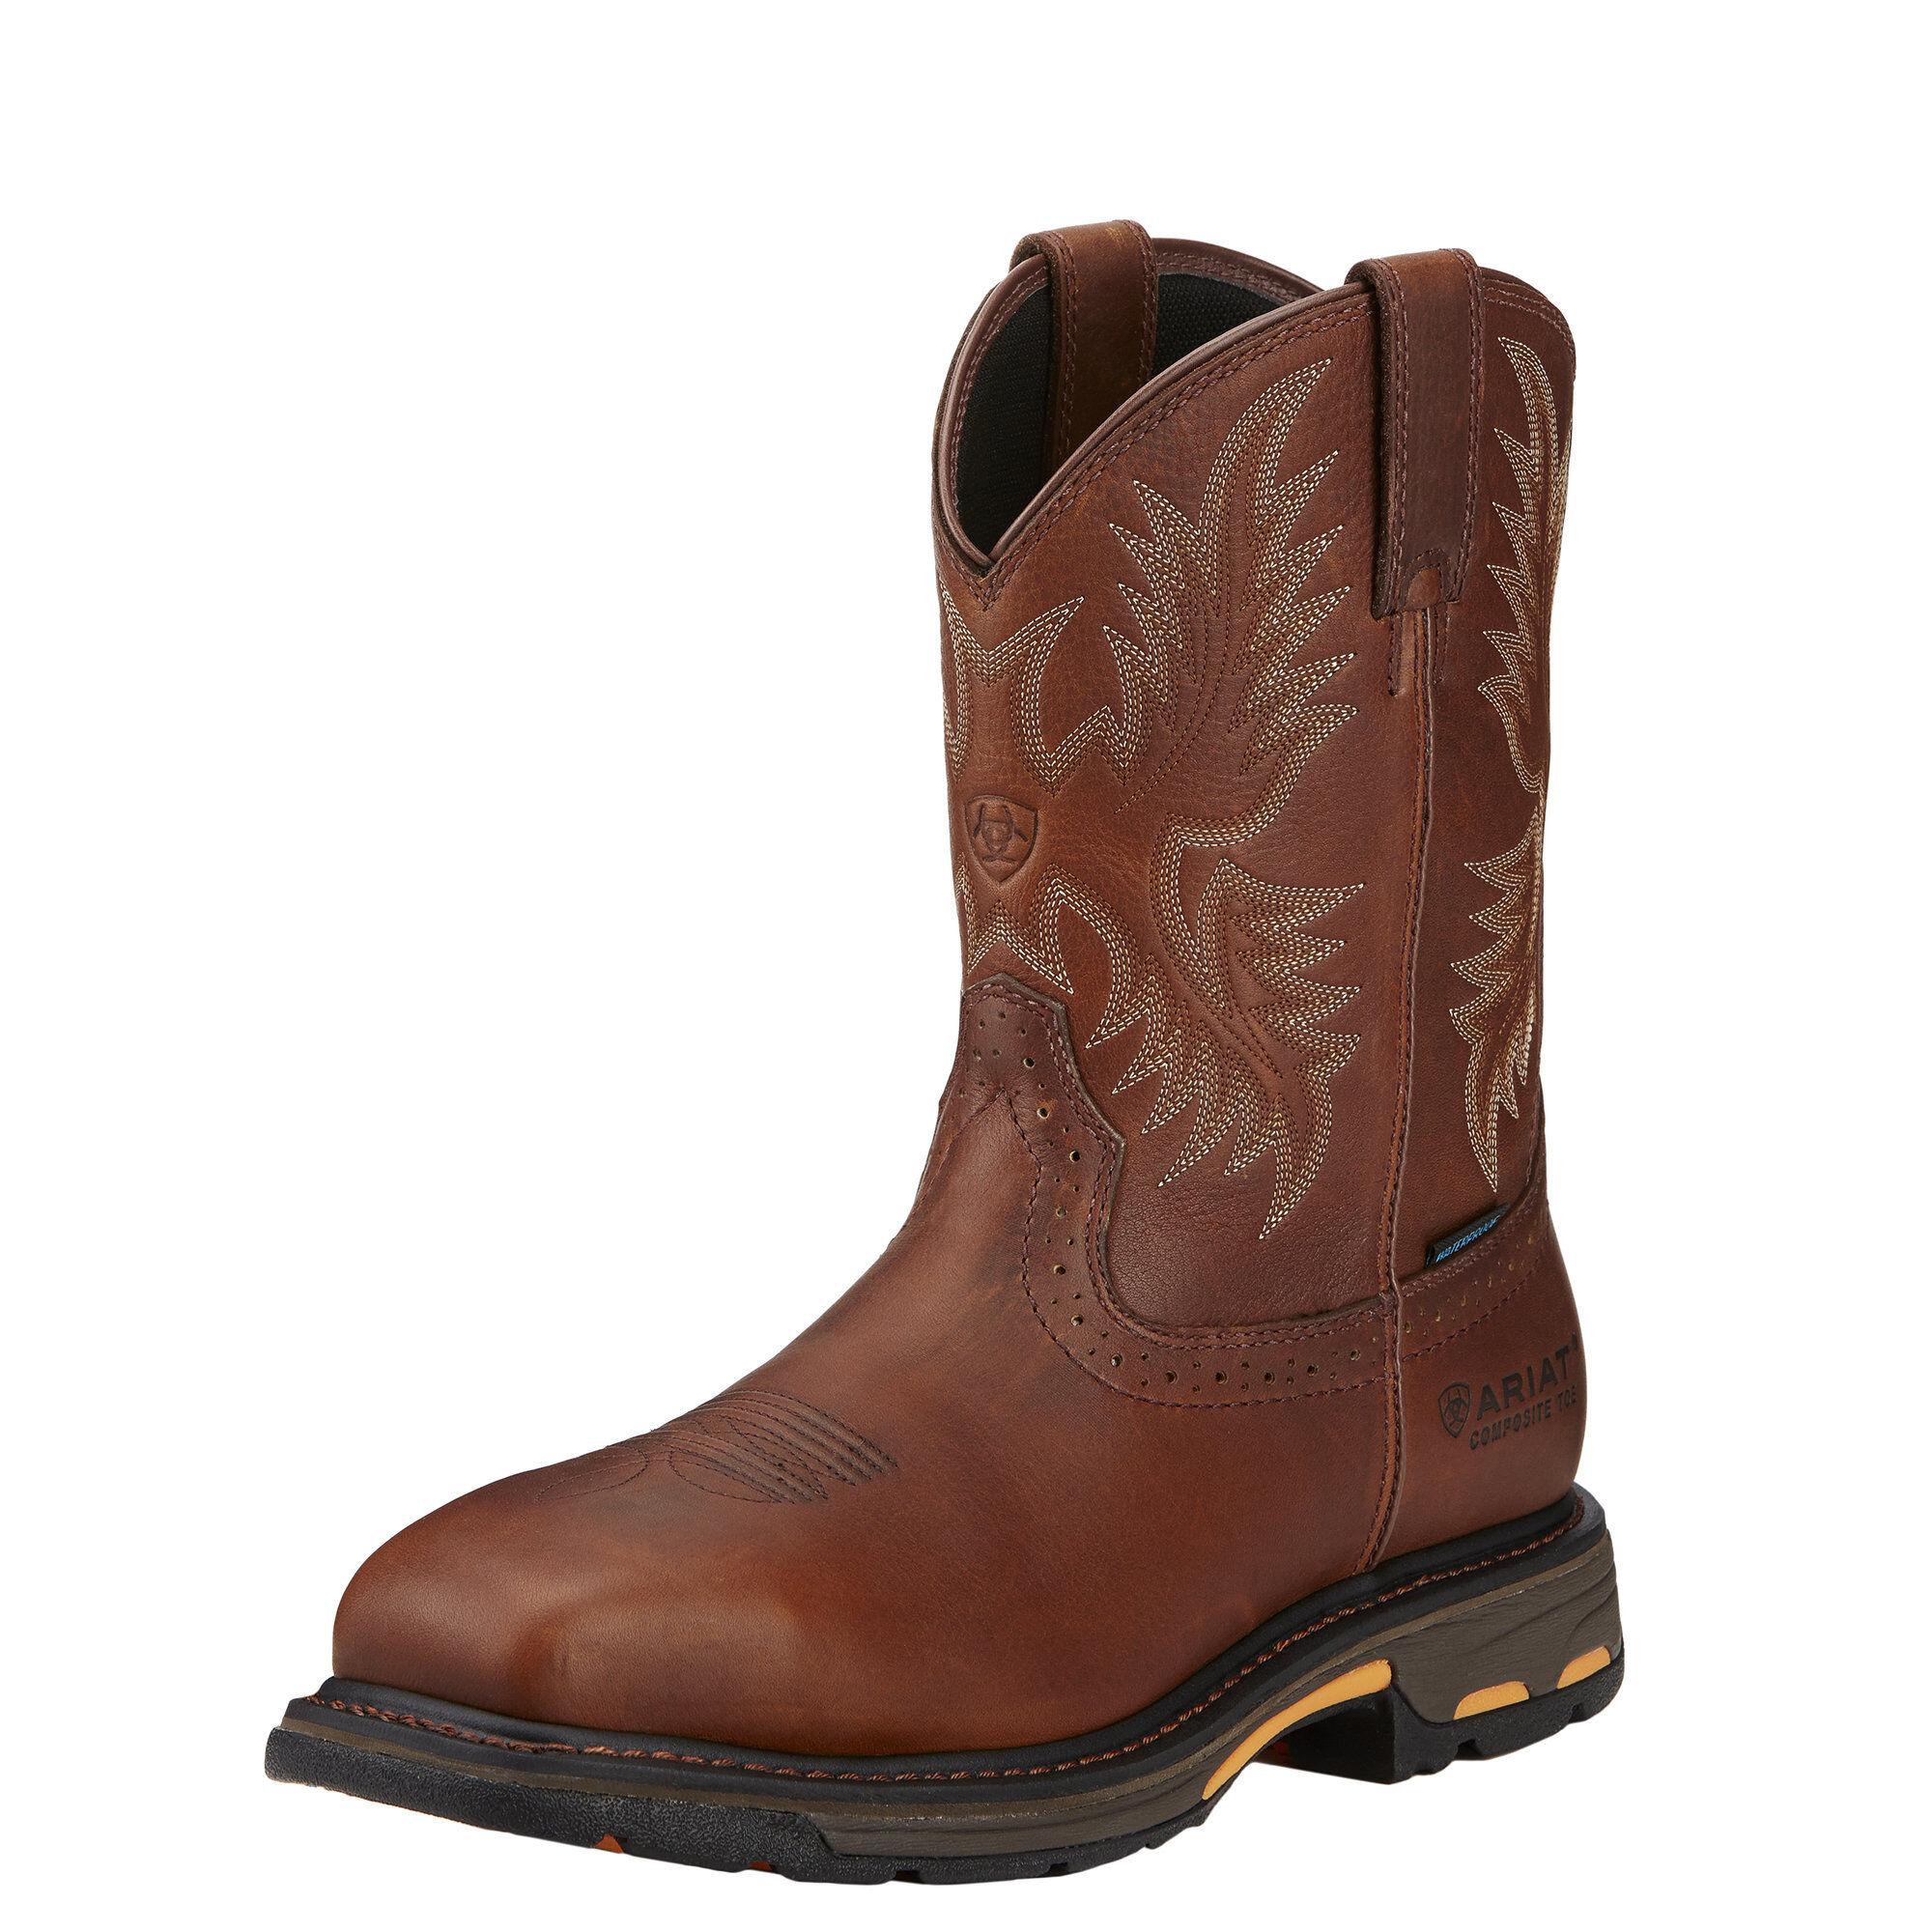 WorkHog CSA Waterproof Composite Toe Work Boot